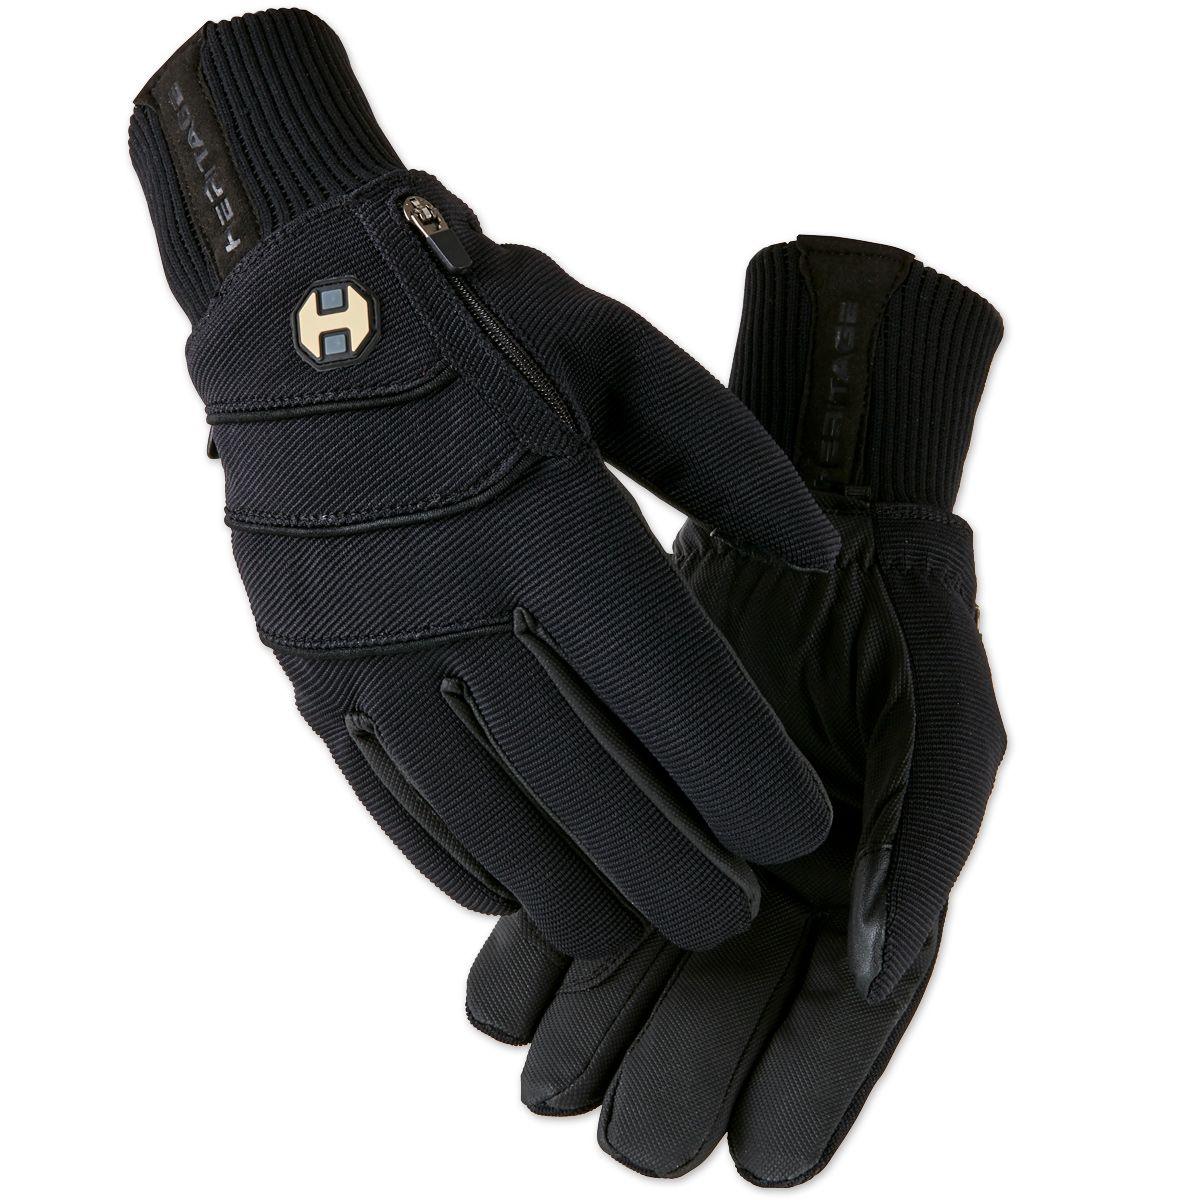 Heritage Extreme Winter Gloves Gloves Winter Gloves Riding Gloves